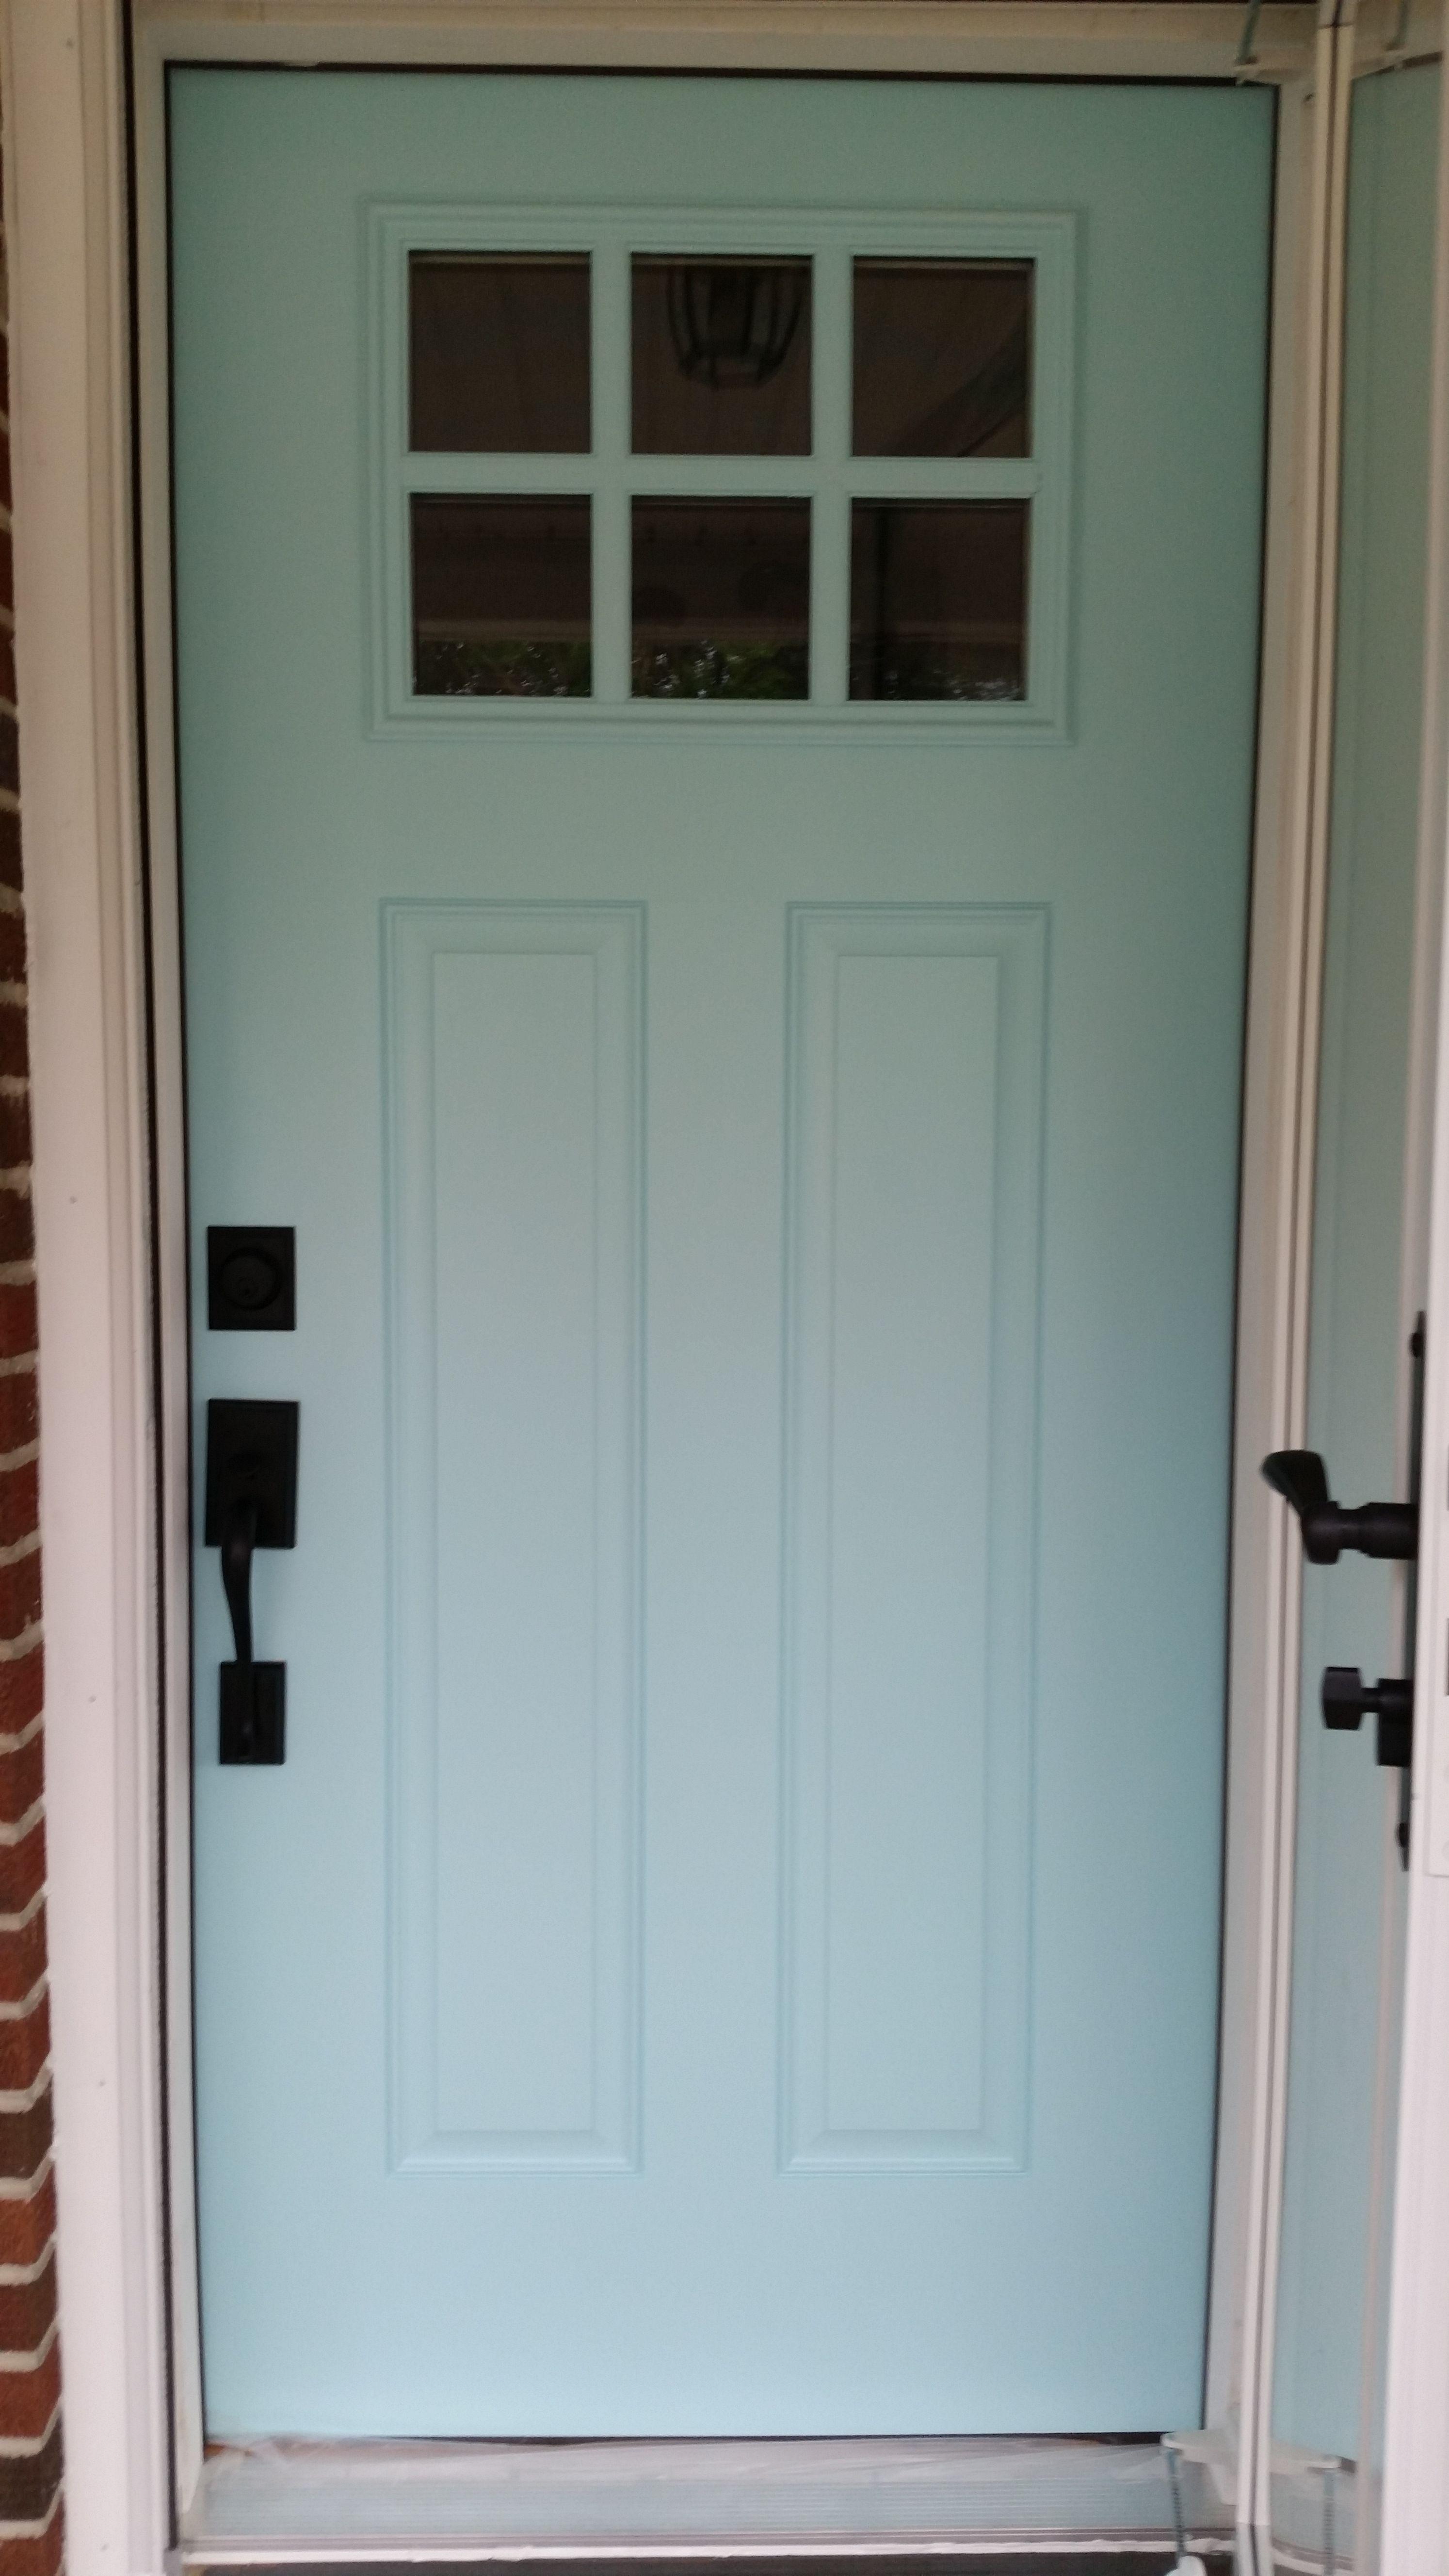 New Front Door Hardware Courtesy Of Schlage Curb Appeal Contest Winner Valspar Color Sea Kiss Paint Hgtv Home Sh Valspar Colors Coastal Design Schlage